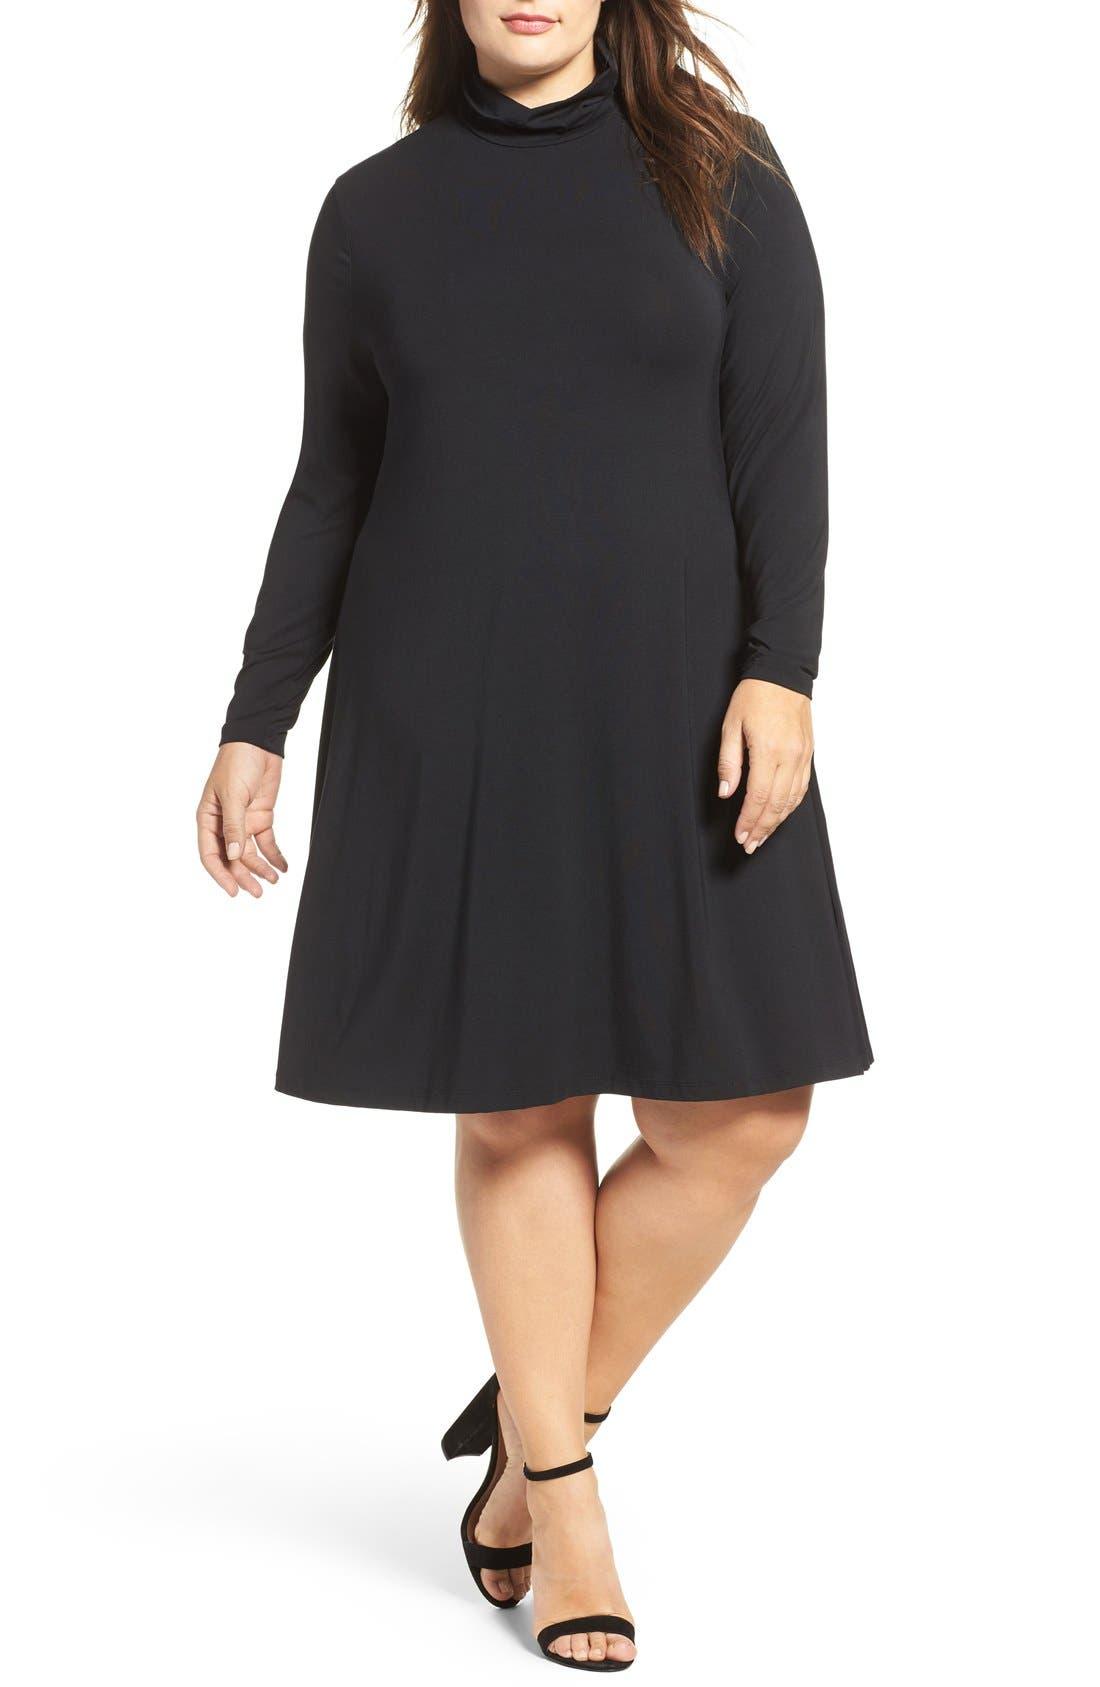 Alternate Image 1 Selected - Tart Sally Turtleneck A-Line Dress